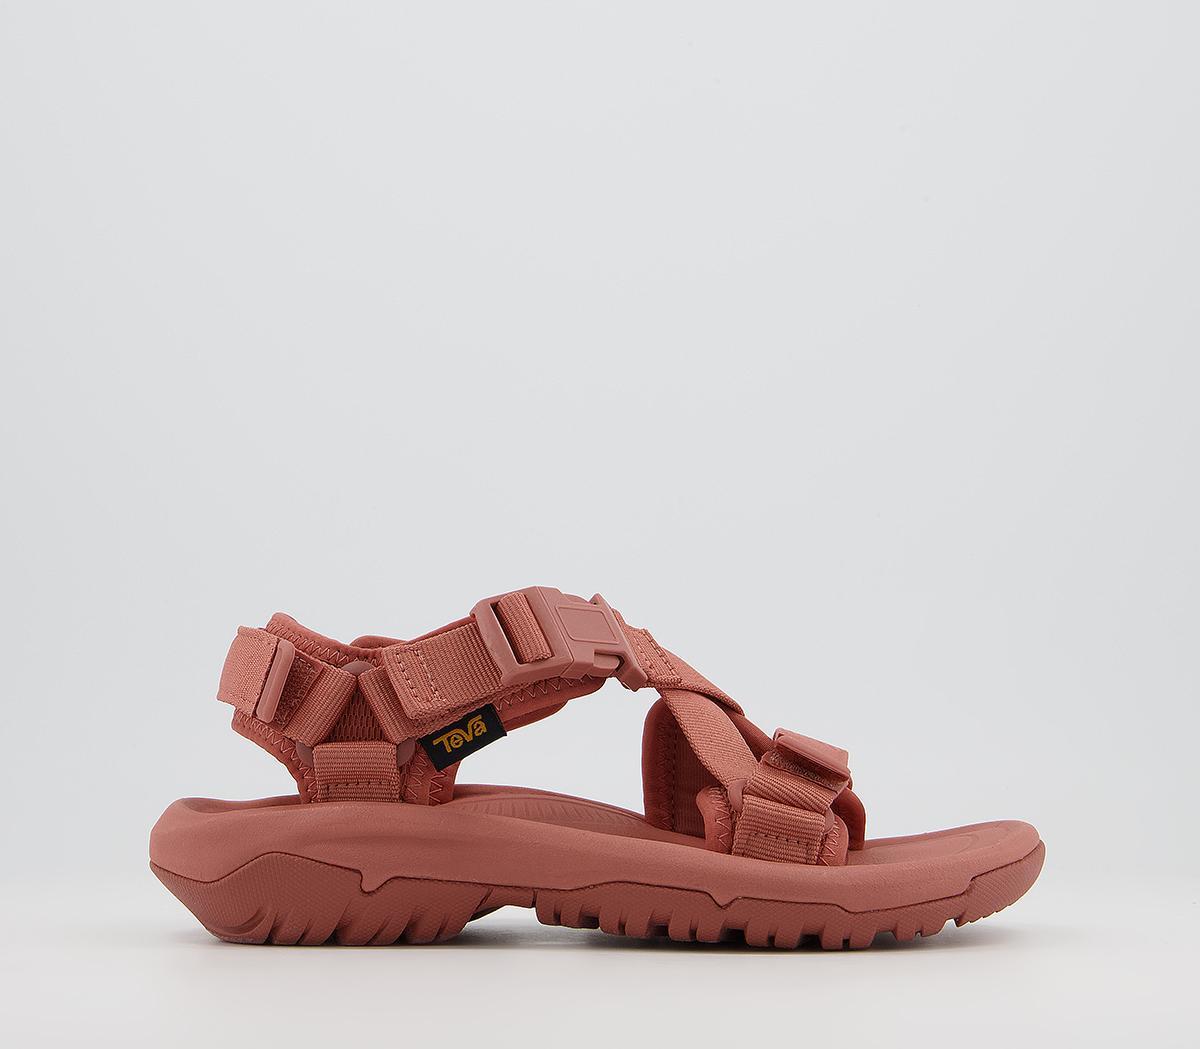 Hurricane Verge Sandals